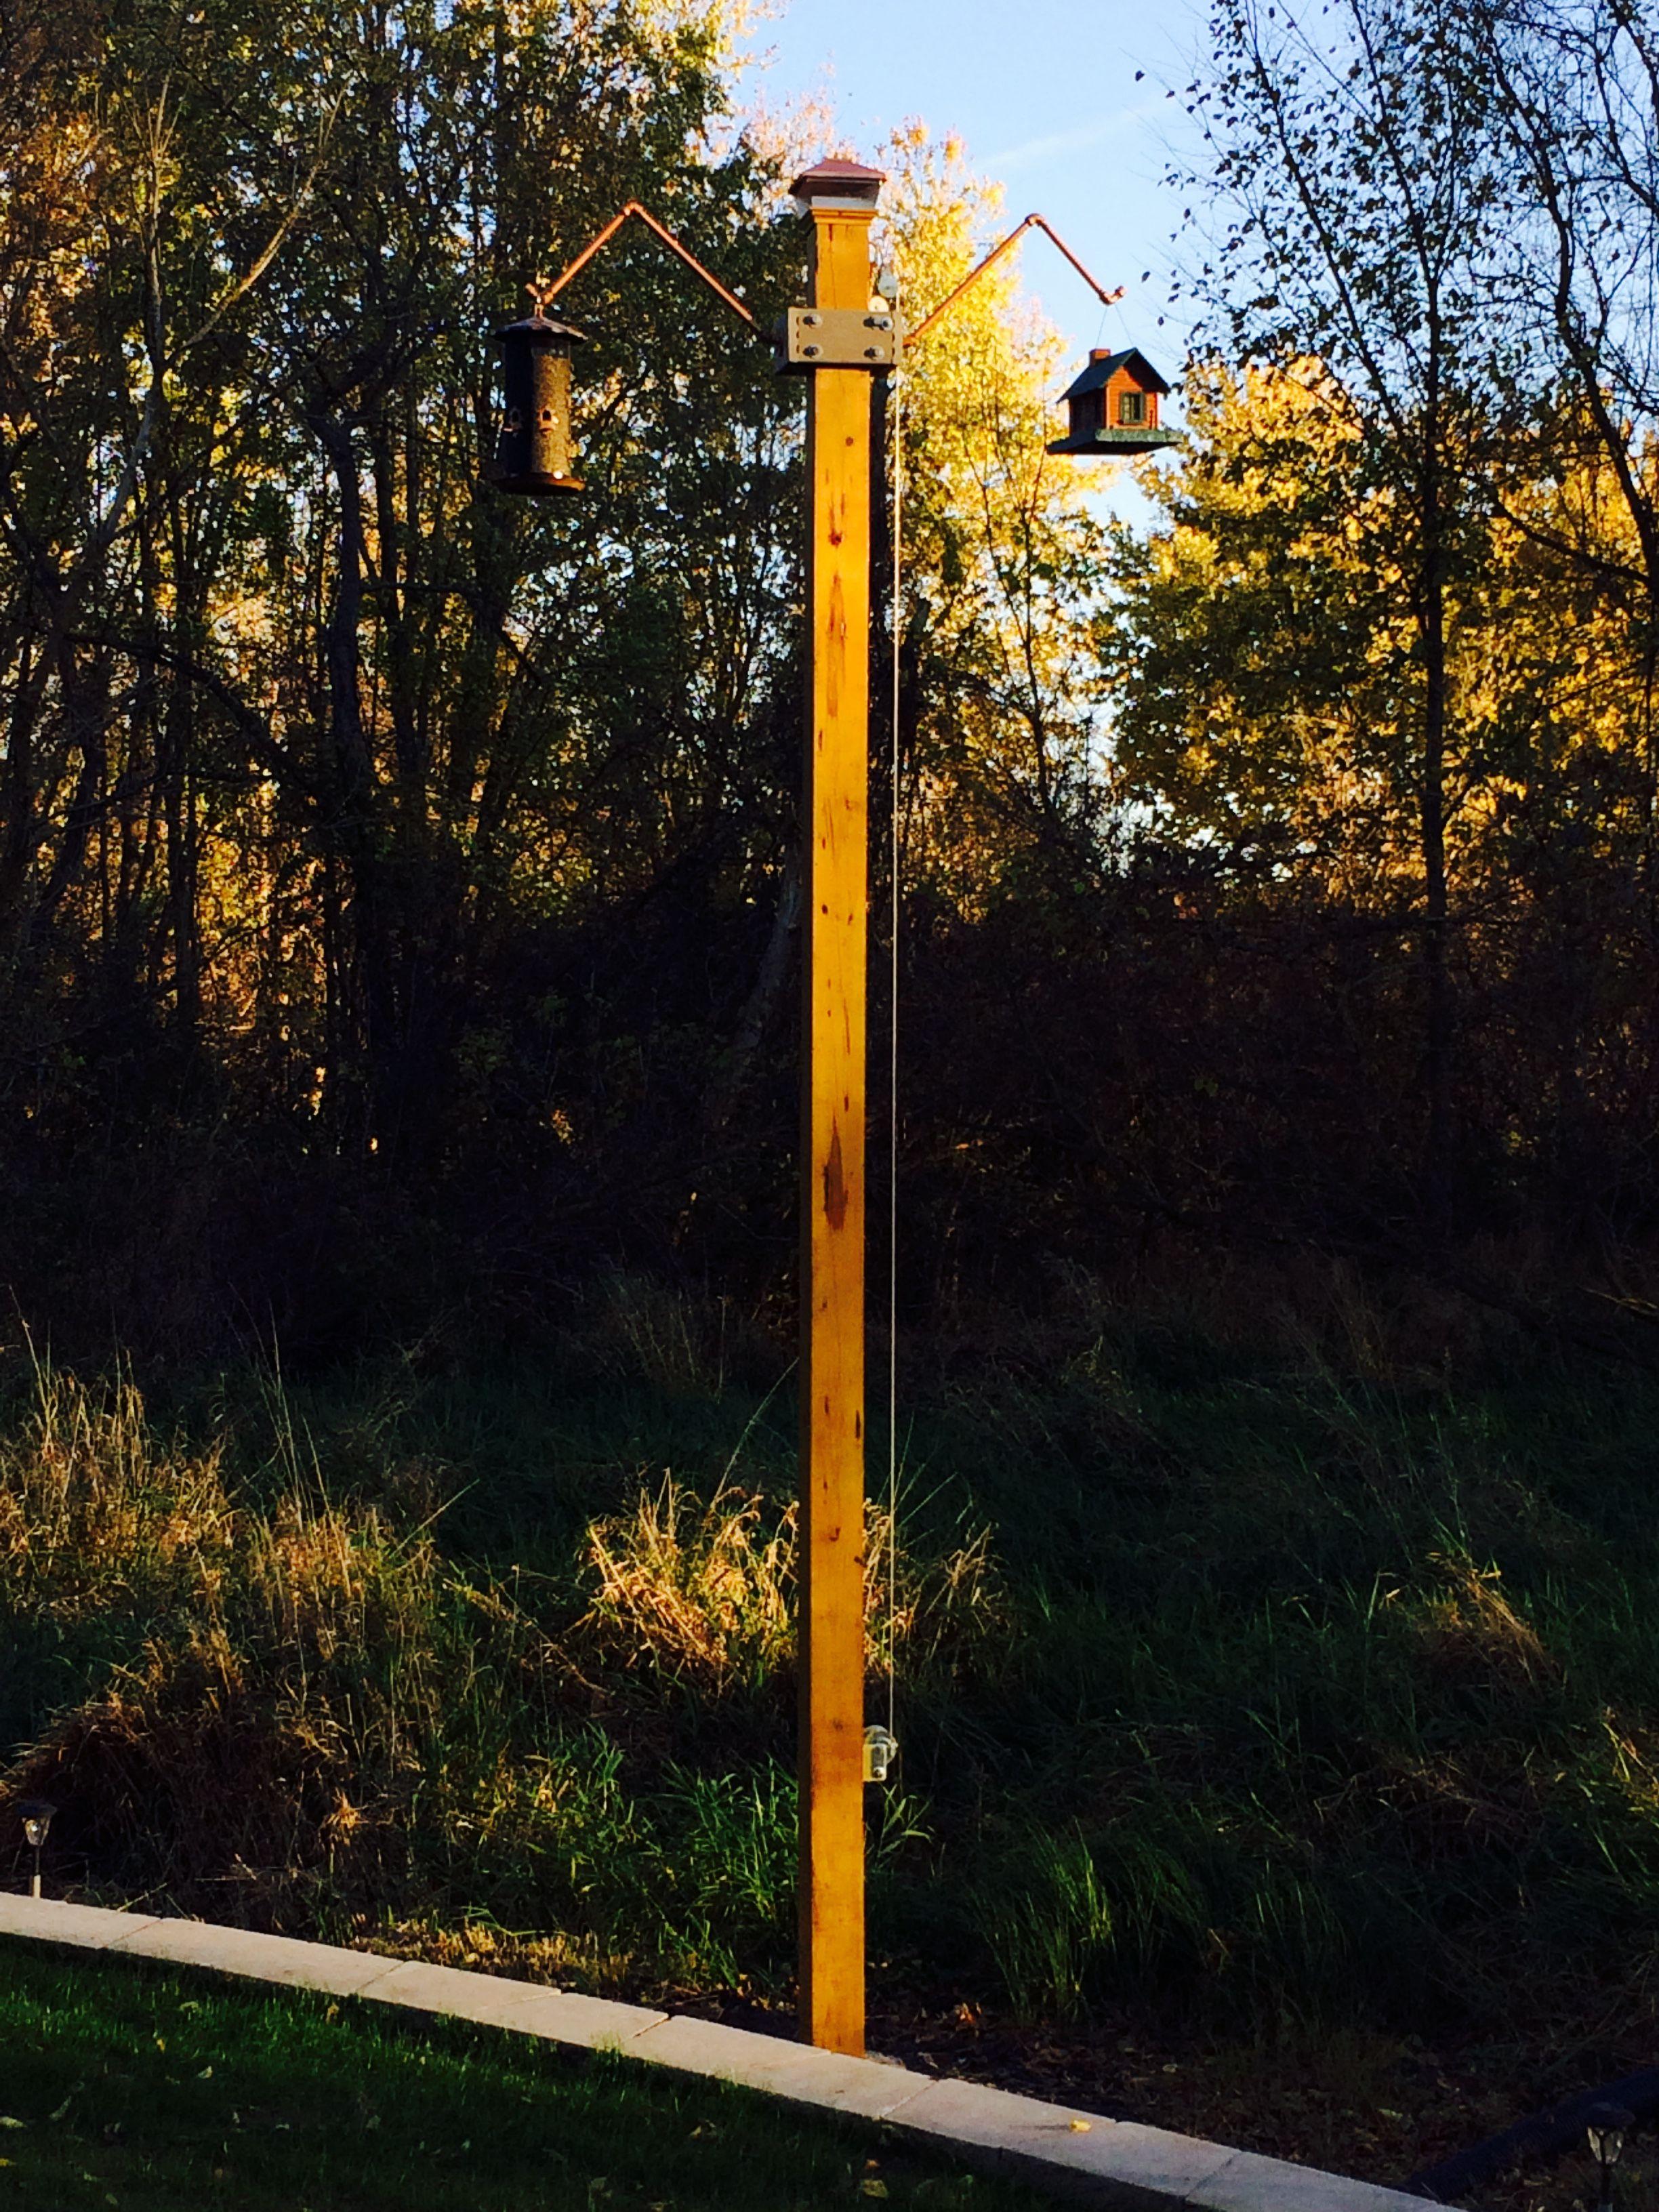 Bird Feeder On Tall 6x6 Post With Transom To Raise And Lower Bird Feeder Poles Bird Feeder Station Bird Feeders